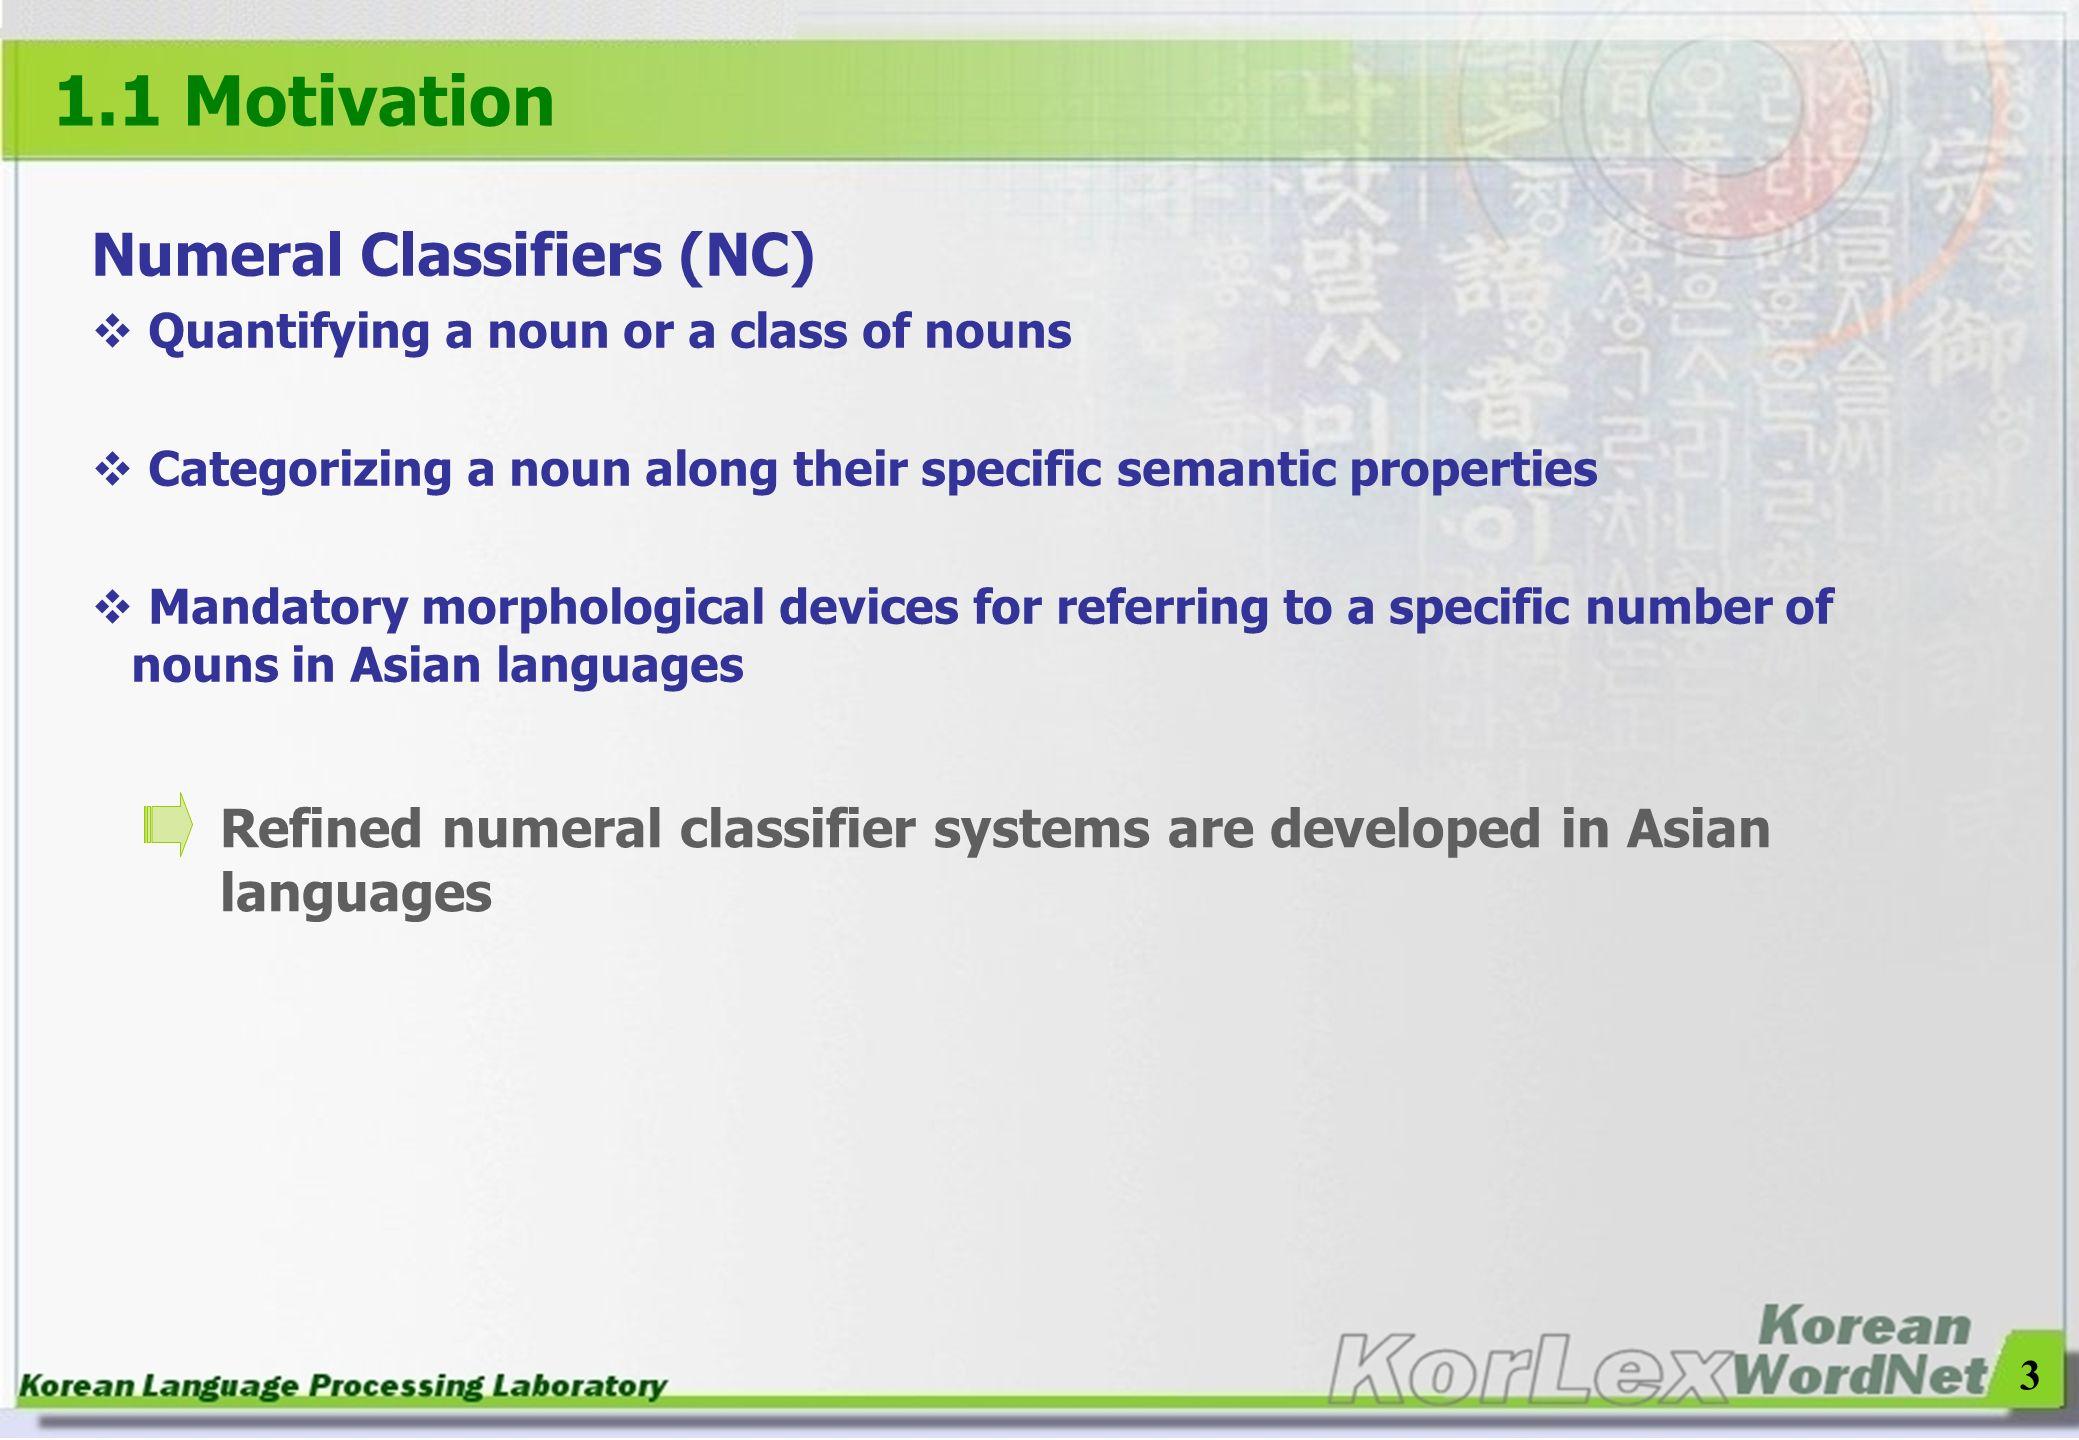 3 1.1 Motivation Numeral Classifiers (NC) Quantifying a noun or a class of nouns Categorizing a noun along their specific semantic properties Mandator